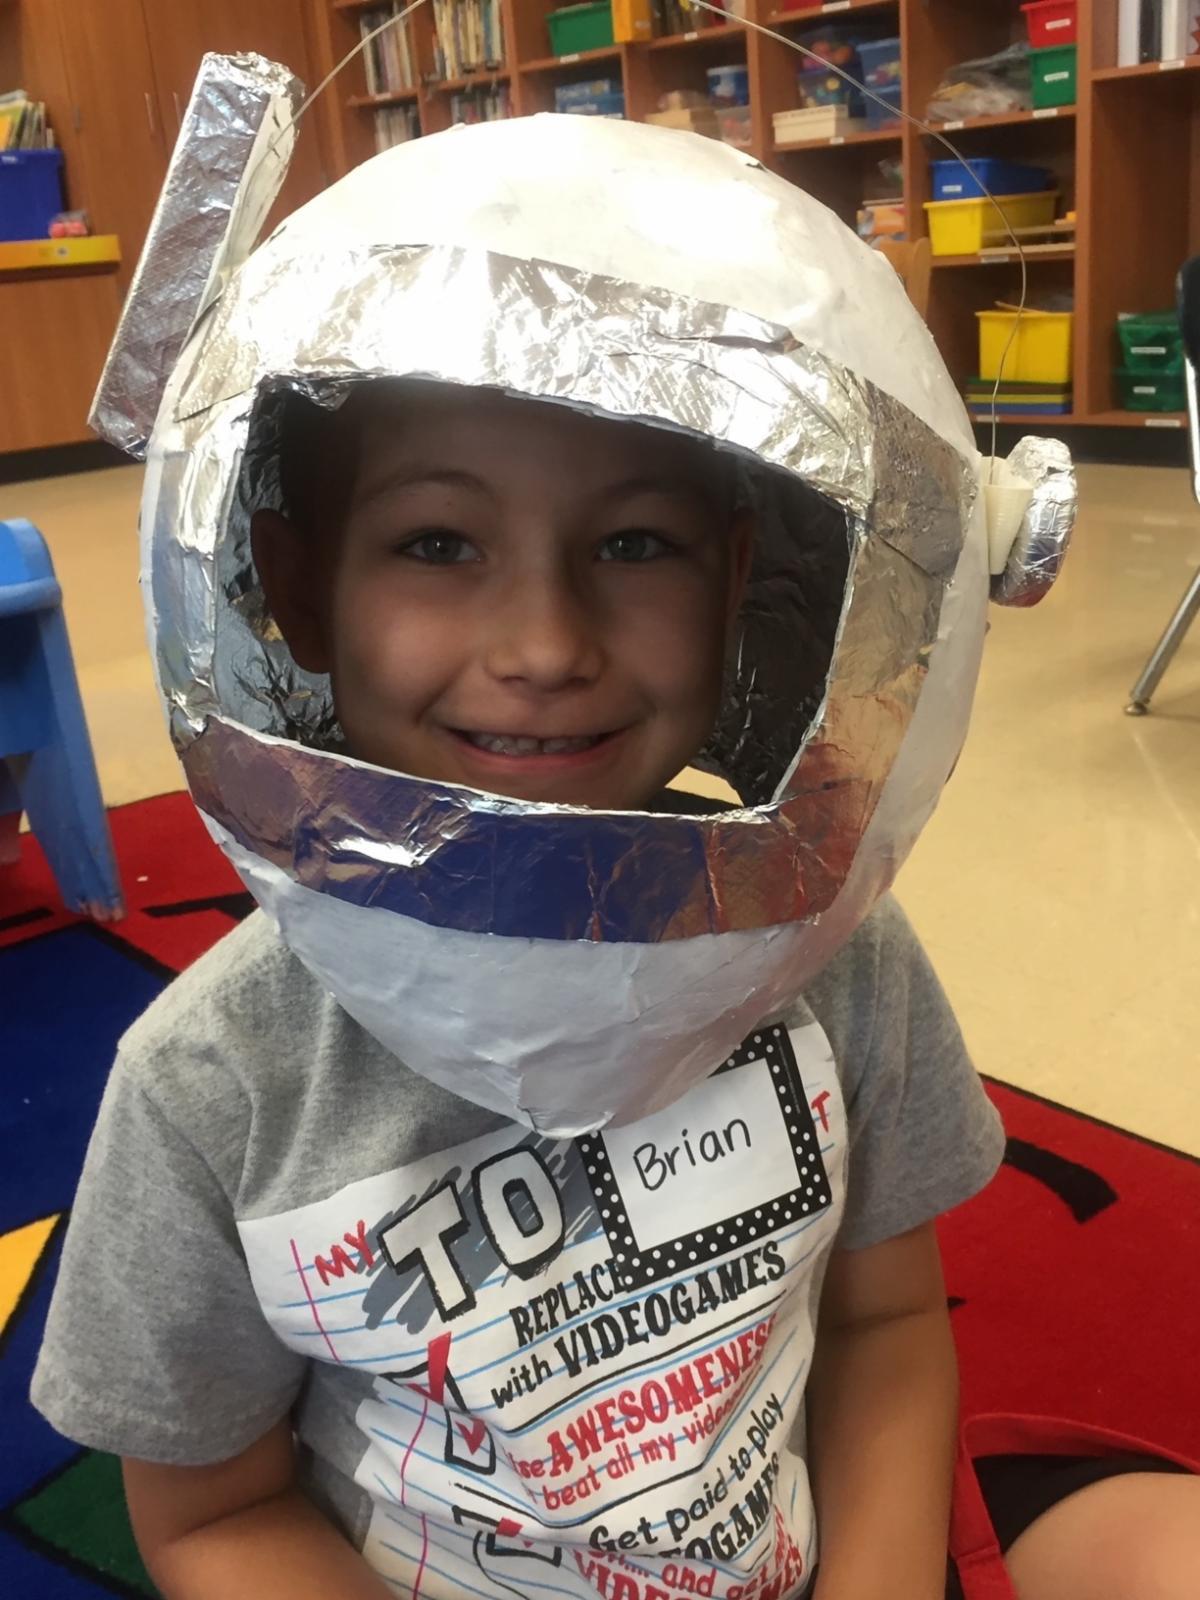 A little boy smiling in an astronaut helmet.